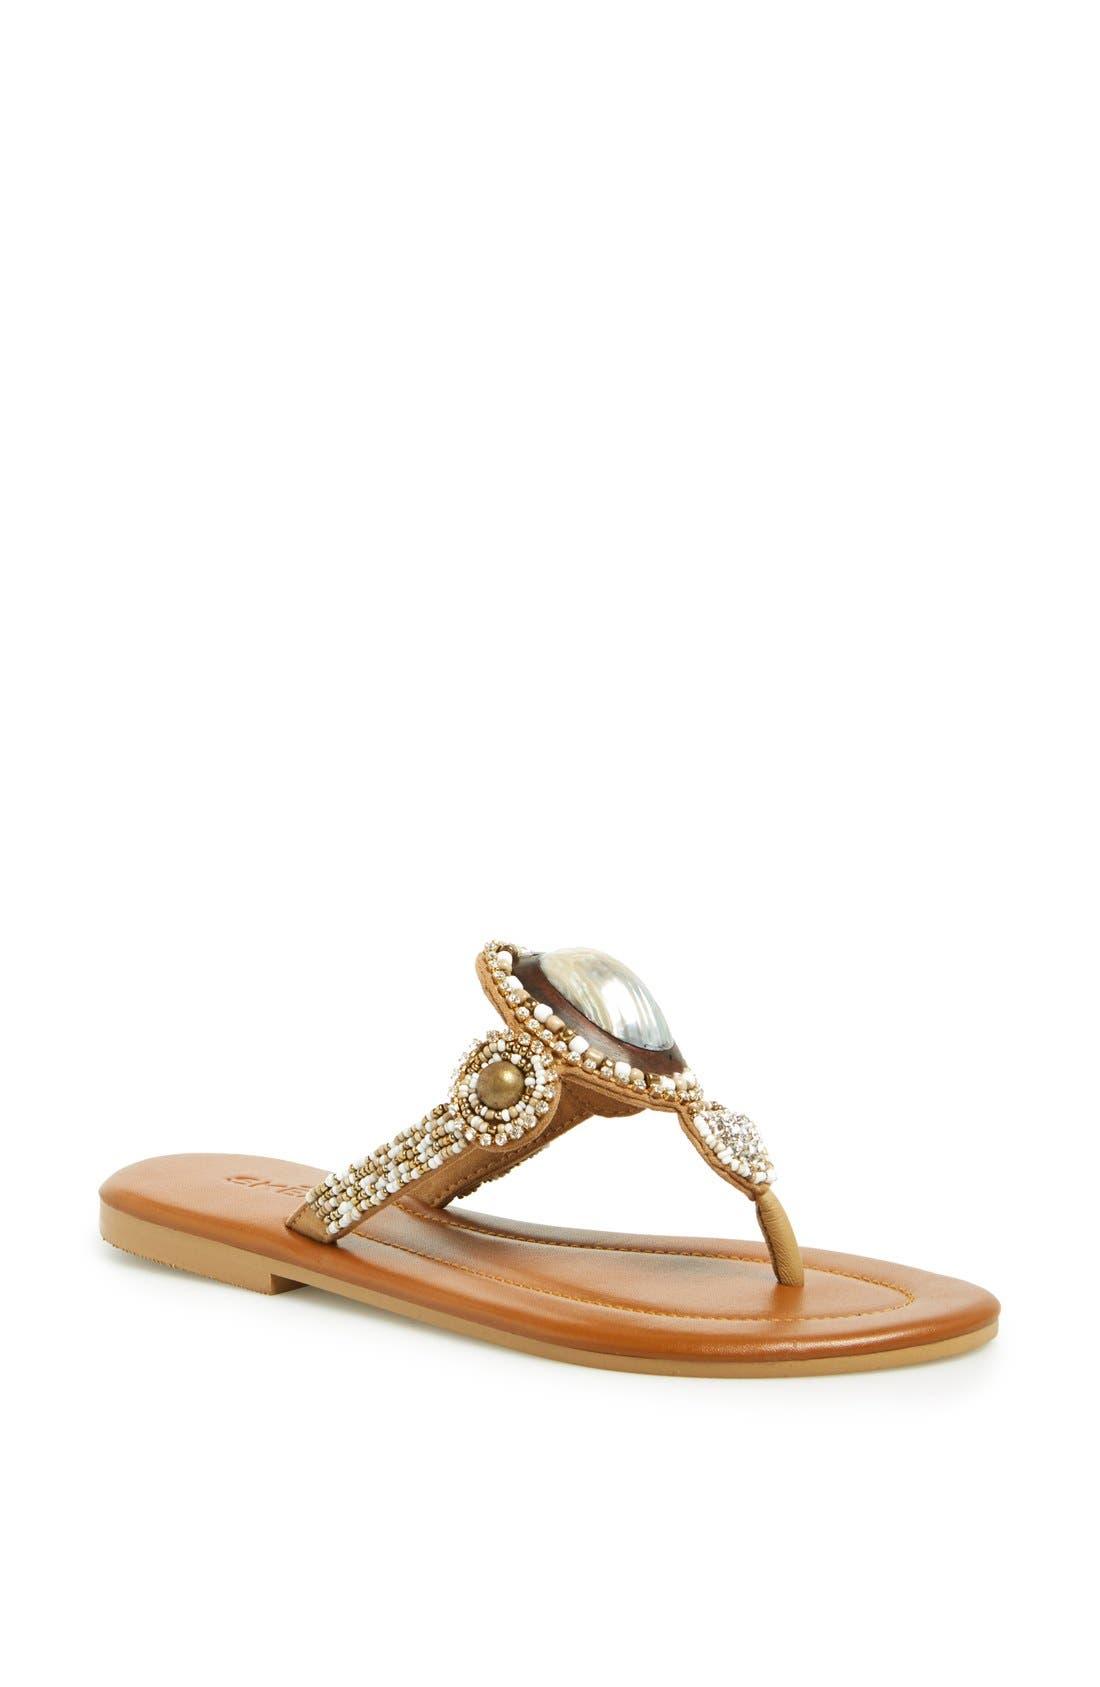 Alternate Image 1 Selected - Skemo 'Siwa' Sandal